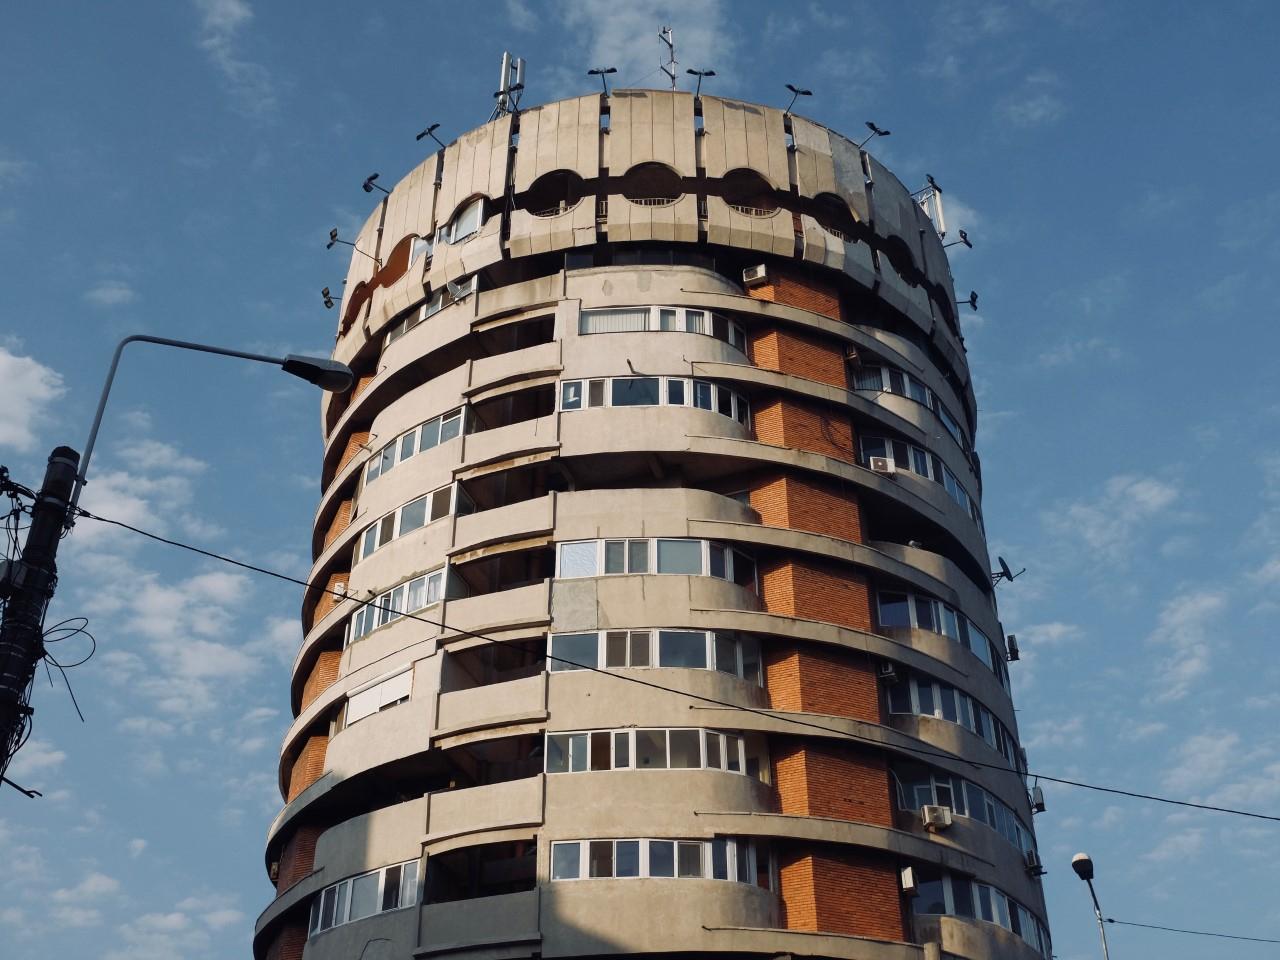 An apartment complex displaying Communist era architecture near the beach in Constanța, Romania.